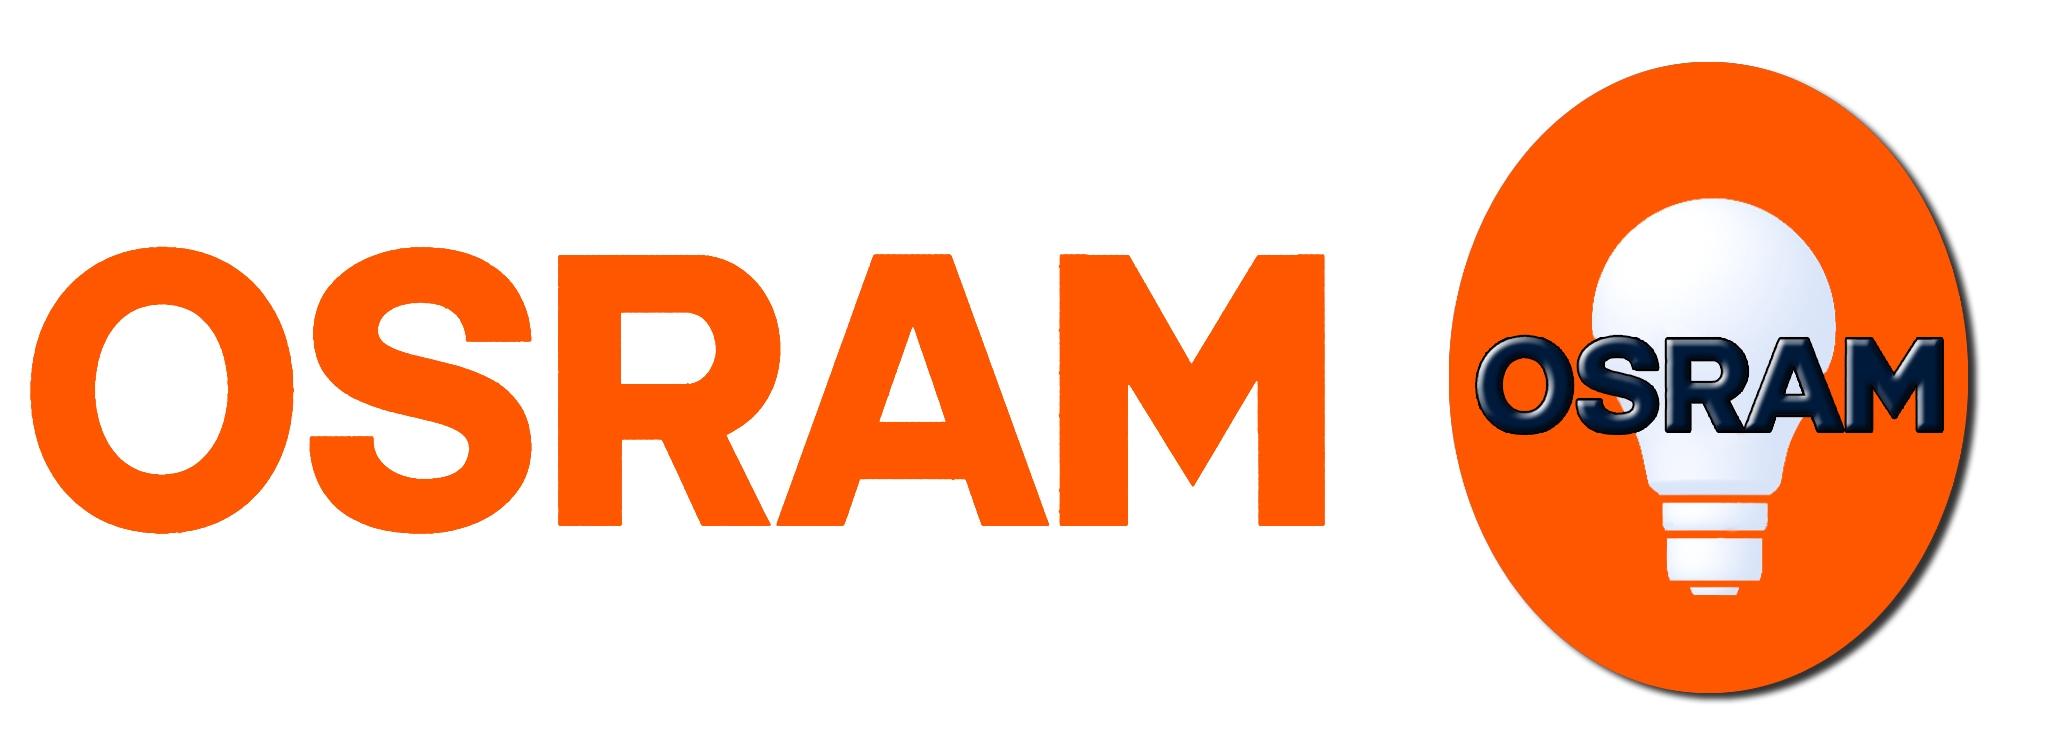 osram_logo.jpg